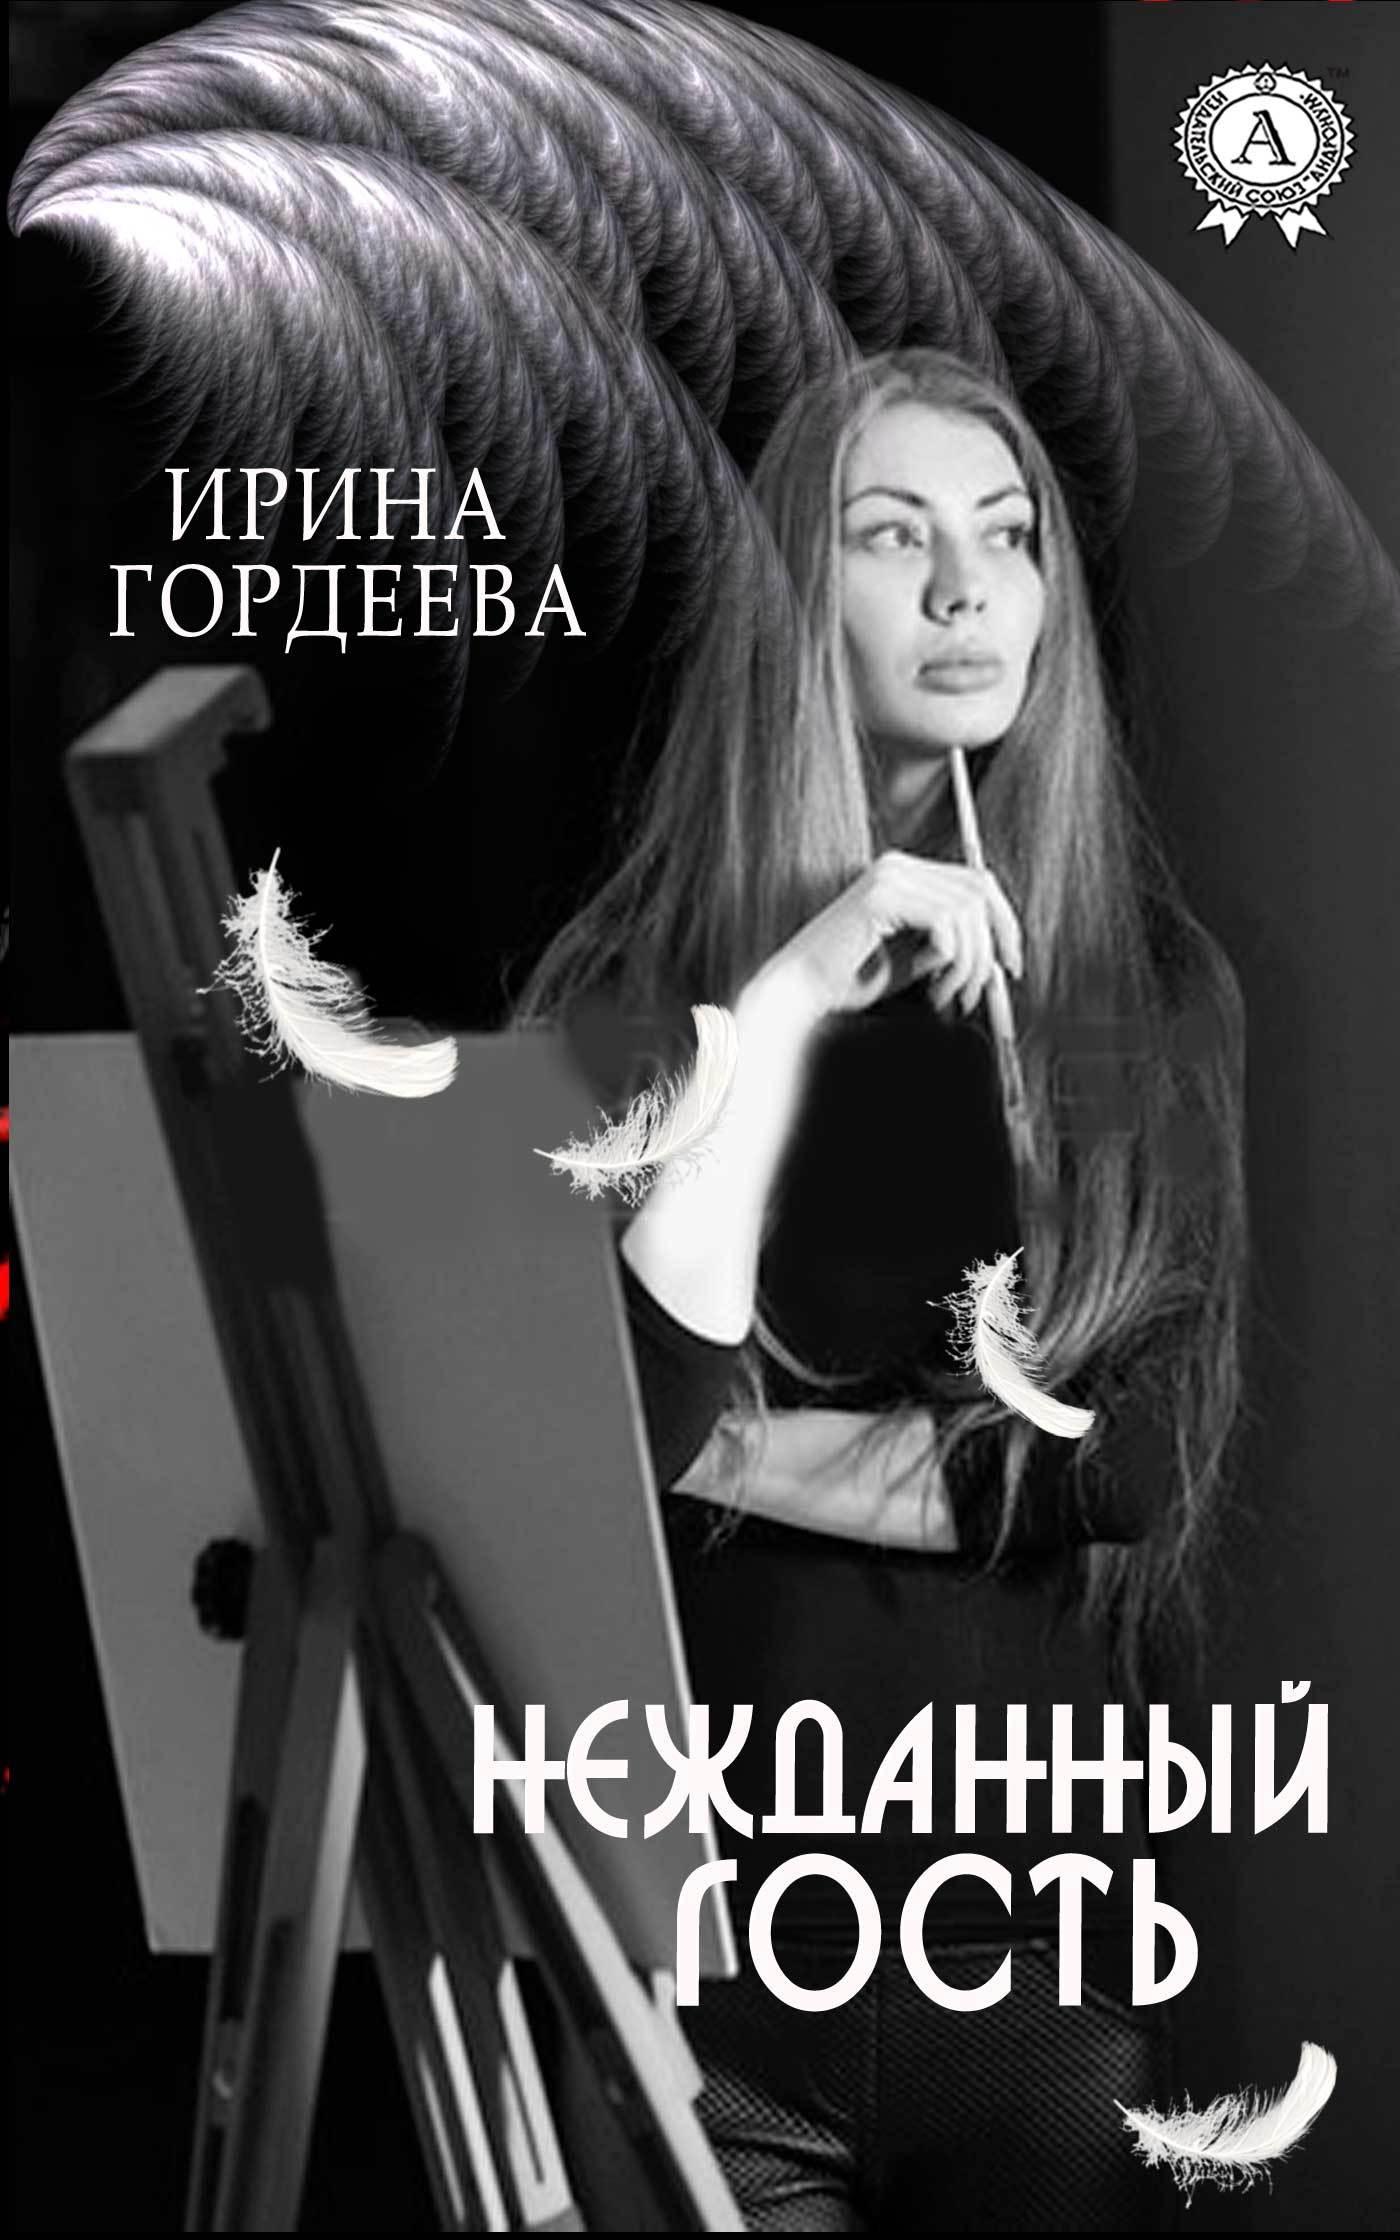 Ирина Гордеева Нежданный гость кристи а нежданный гость